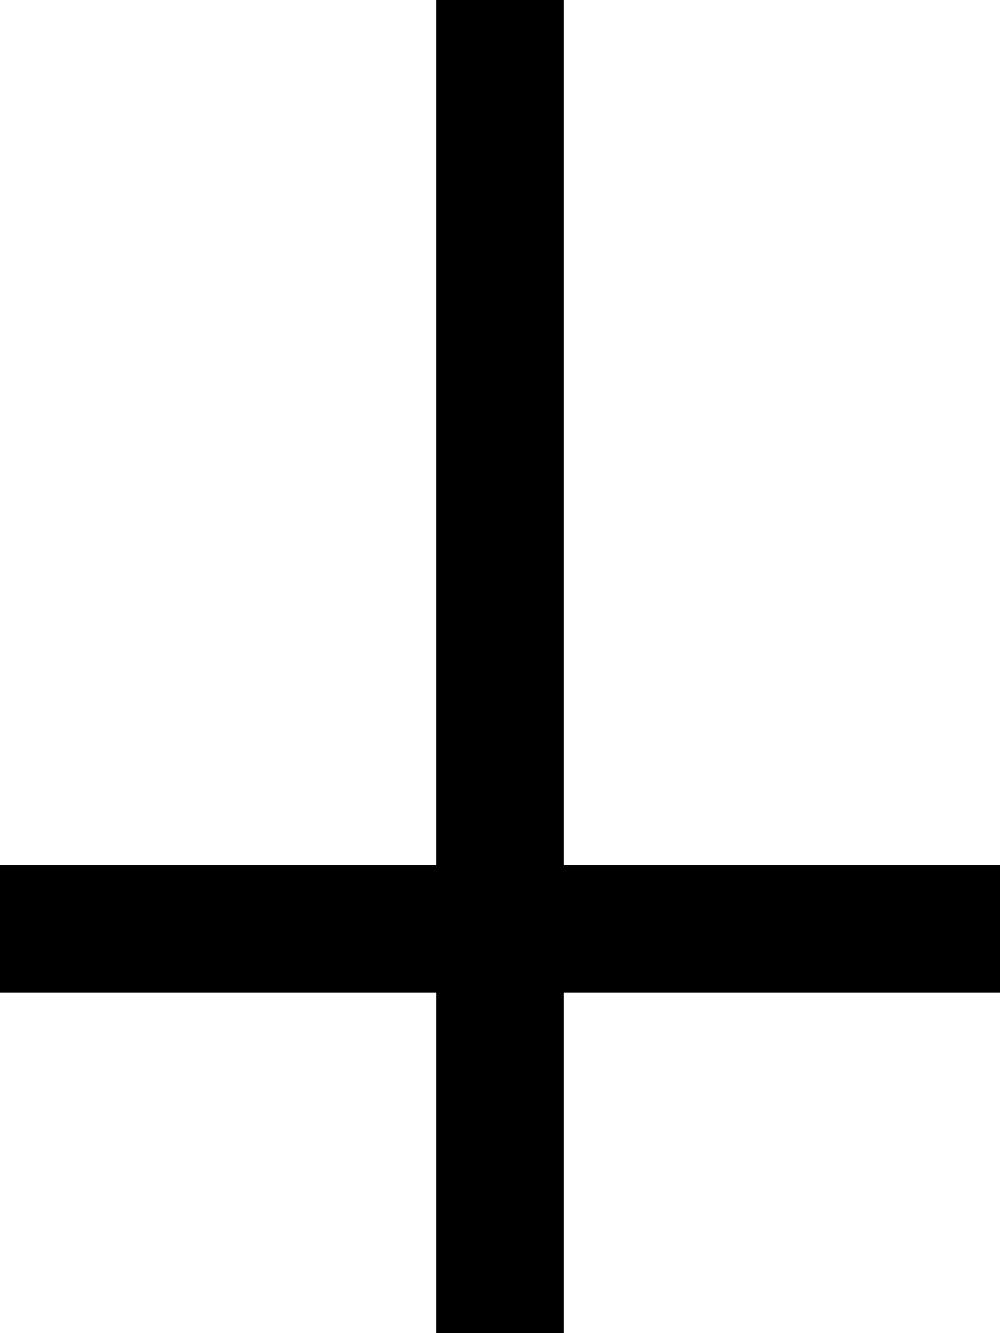 St Peters Cross Symbols